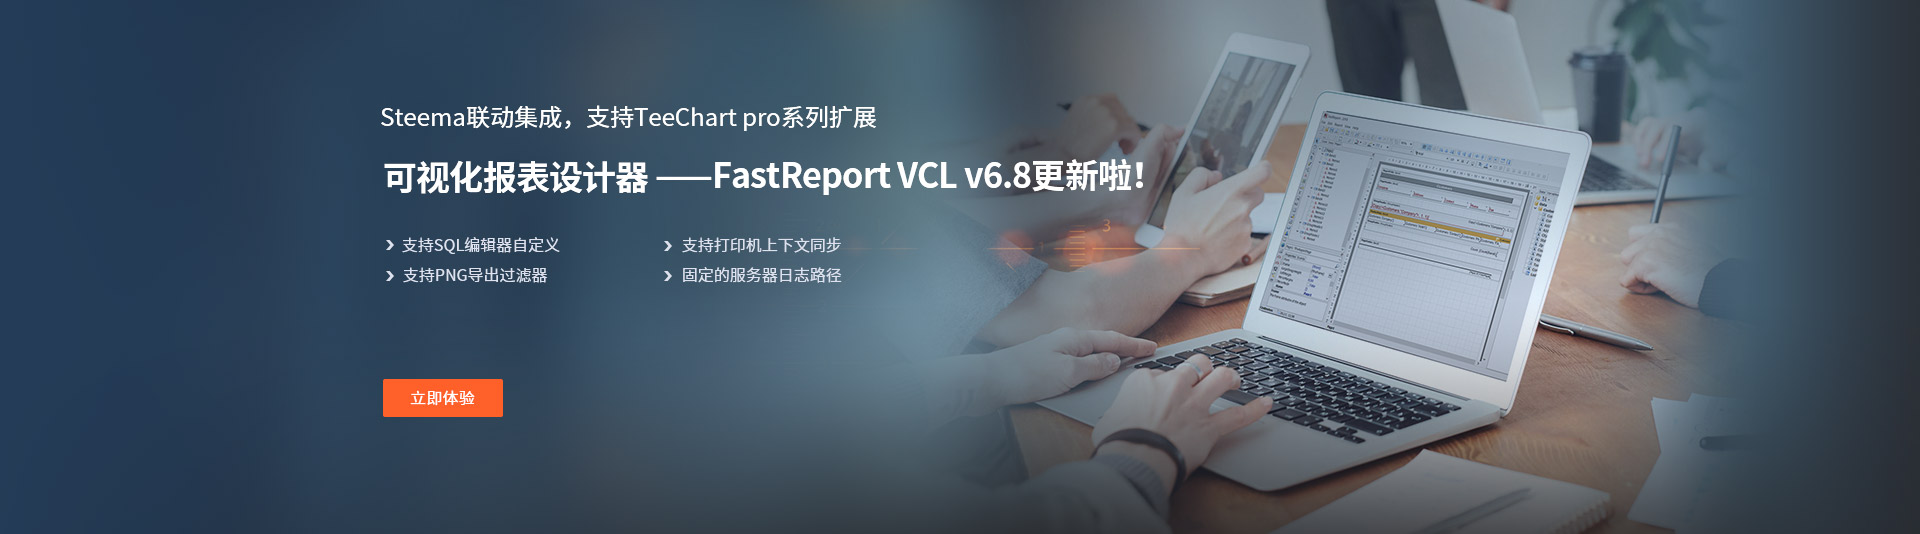 FastReport_VCL_6.8版本更新